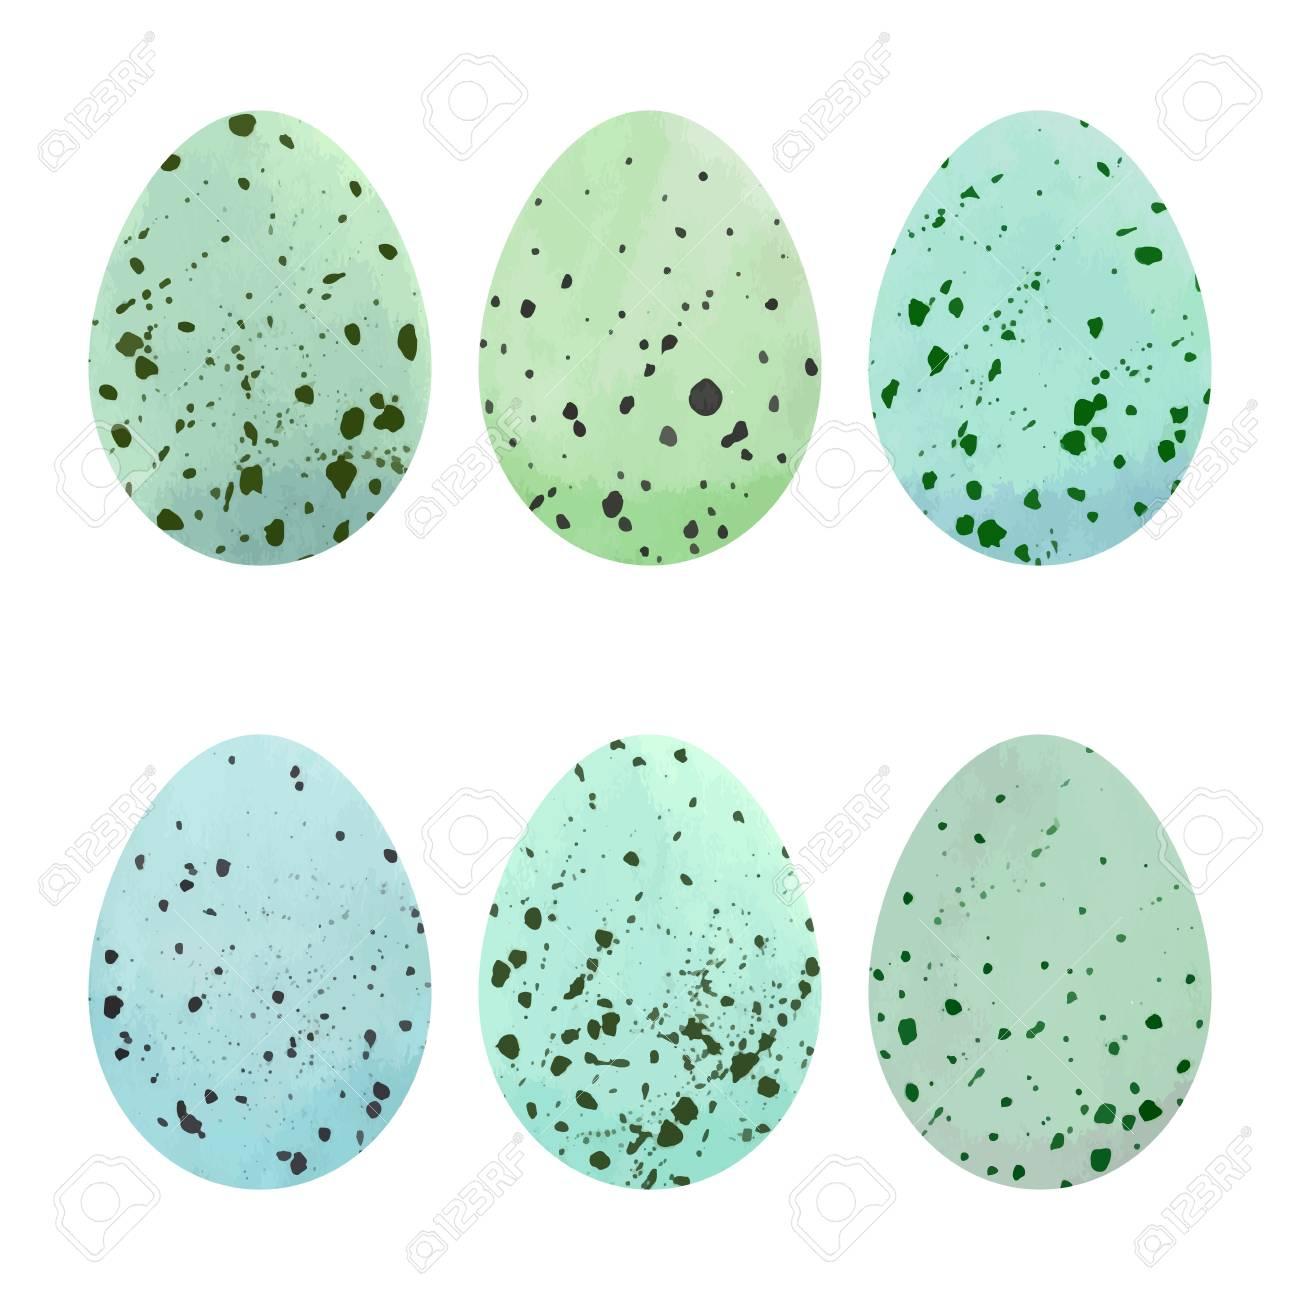 Watercolor Easter eggs set. Vector design elements. - 68885124